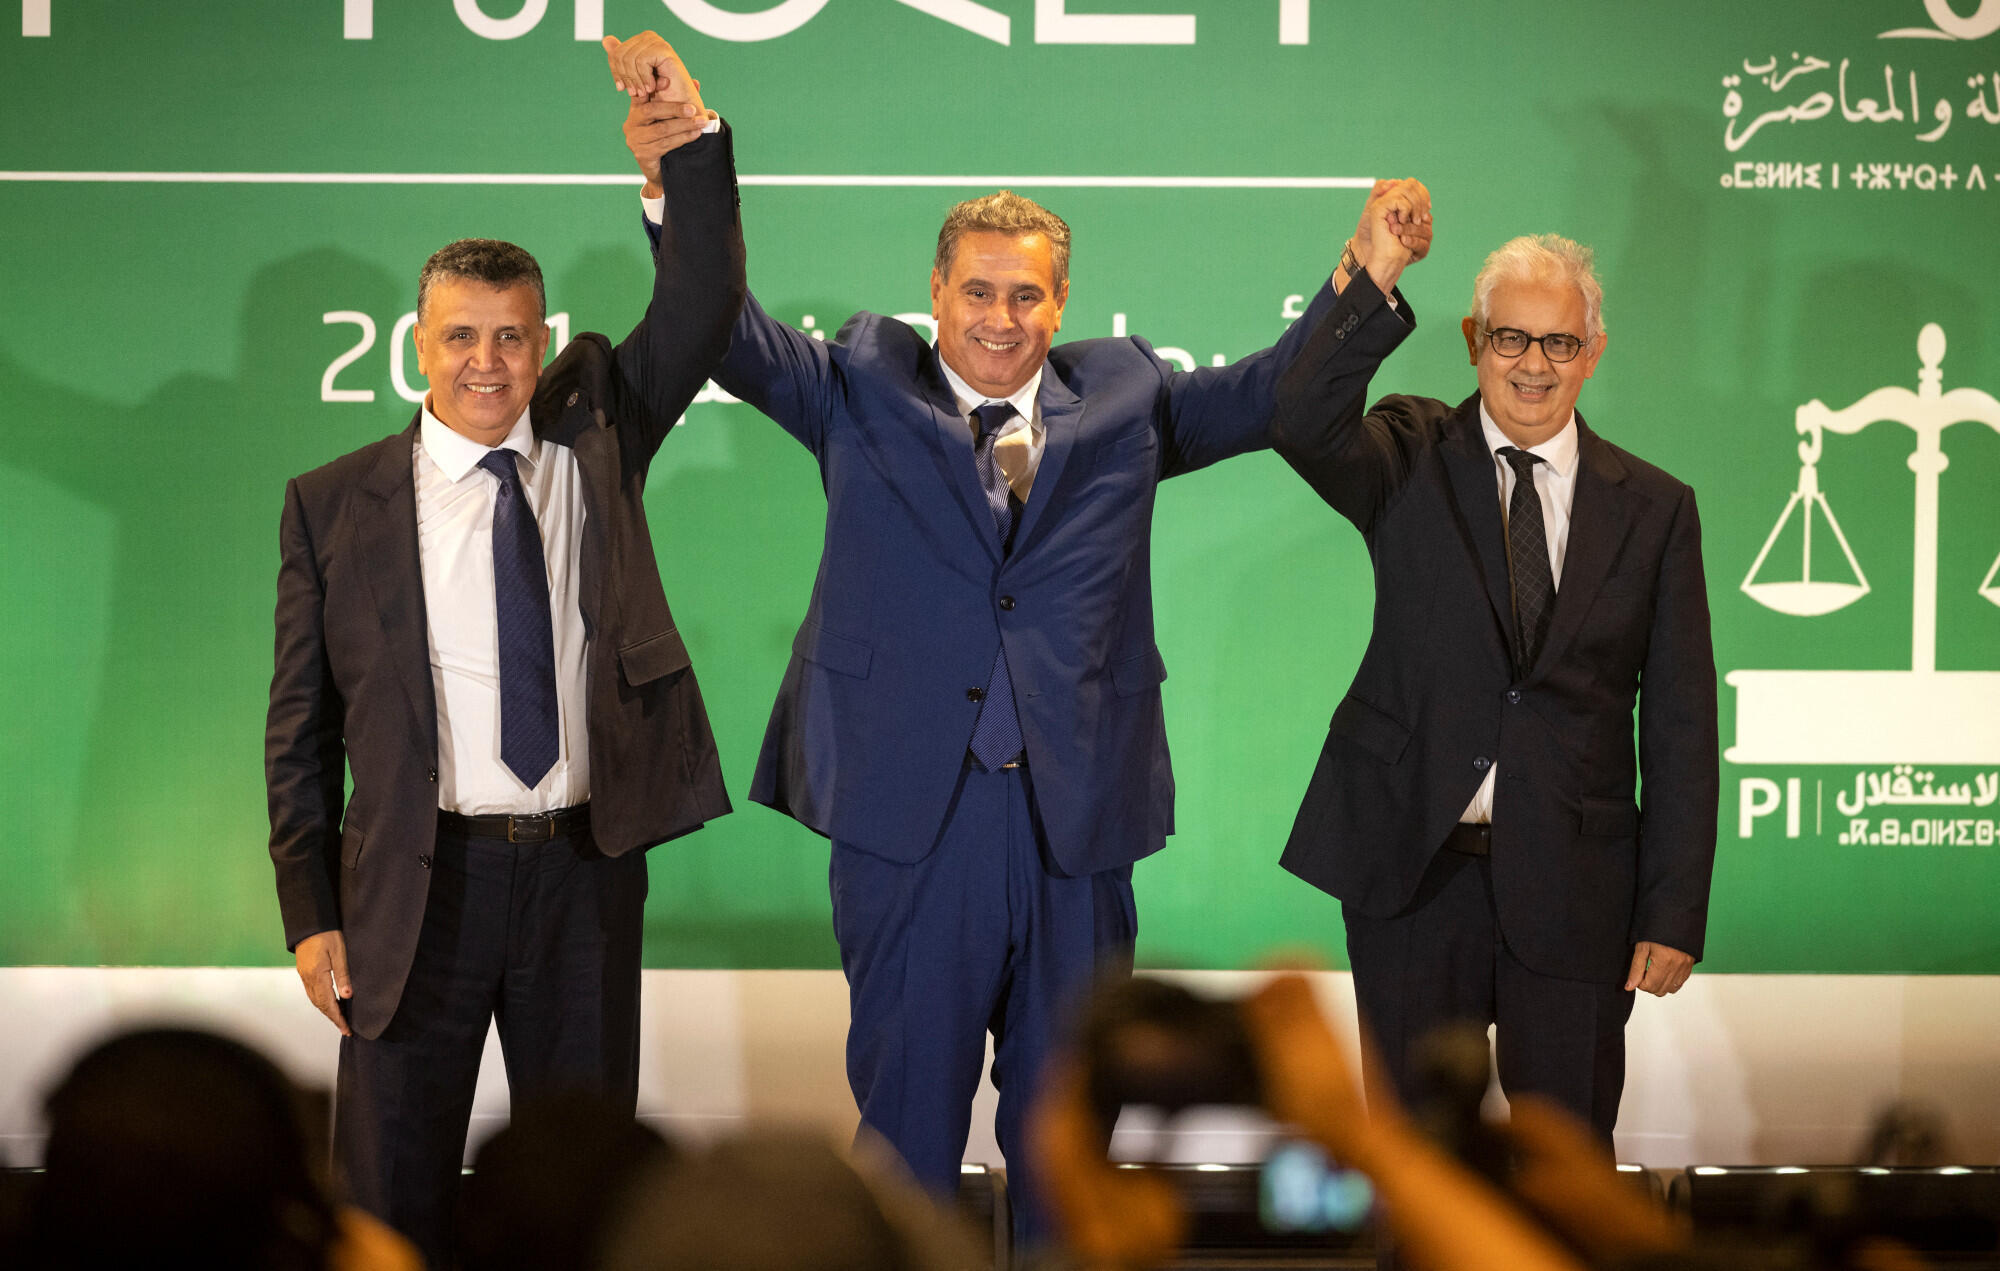 Maroc coalition  Aziz Akhannouch Abdellatif Ouahbi Nizar Baraka